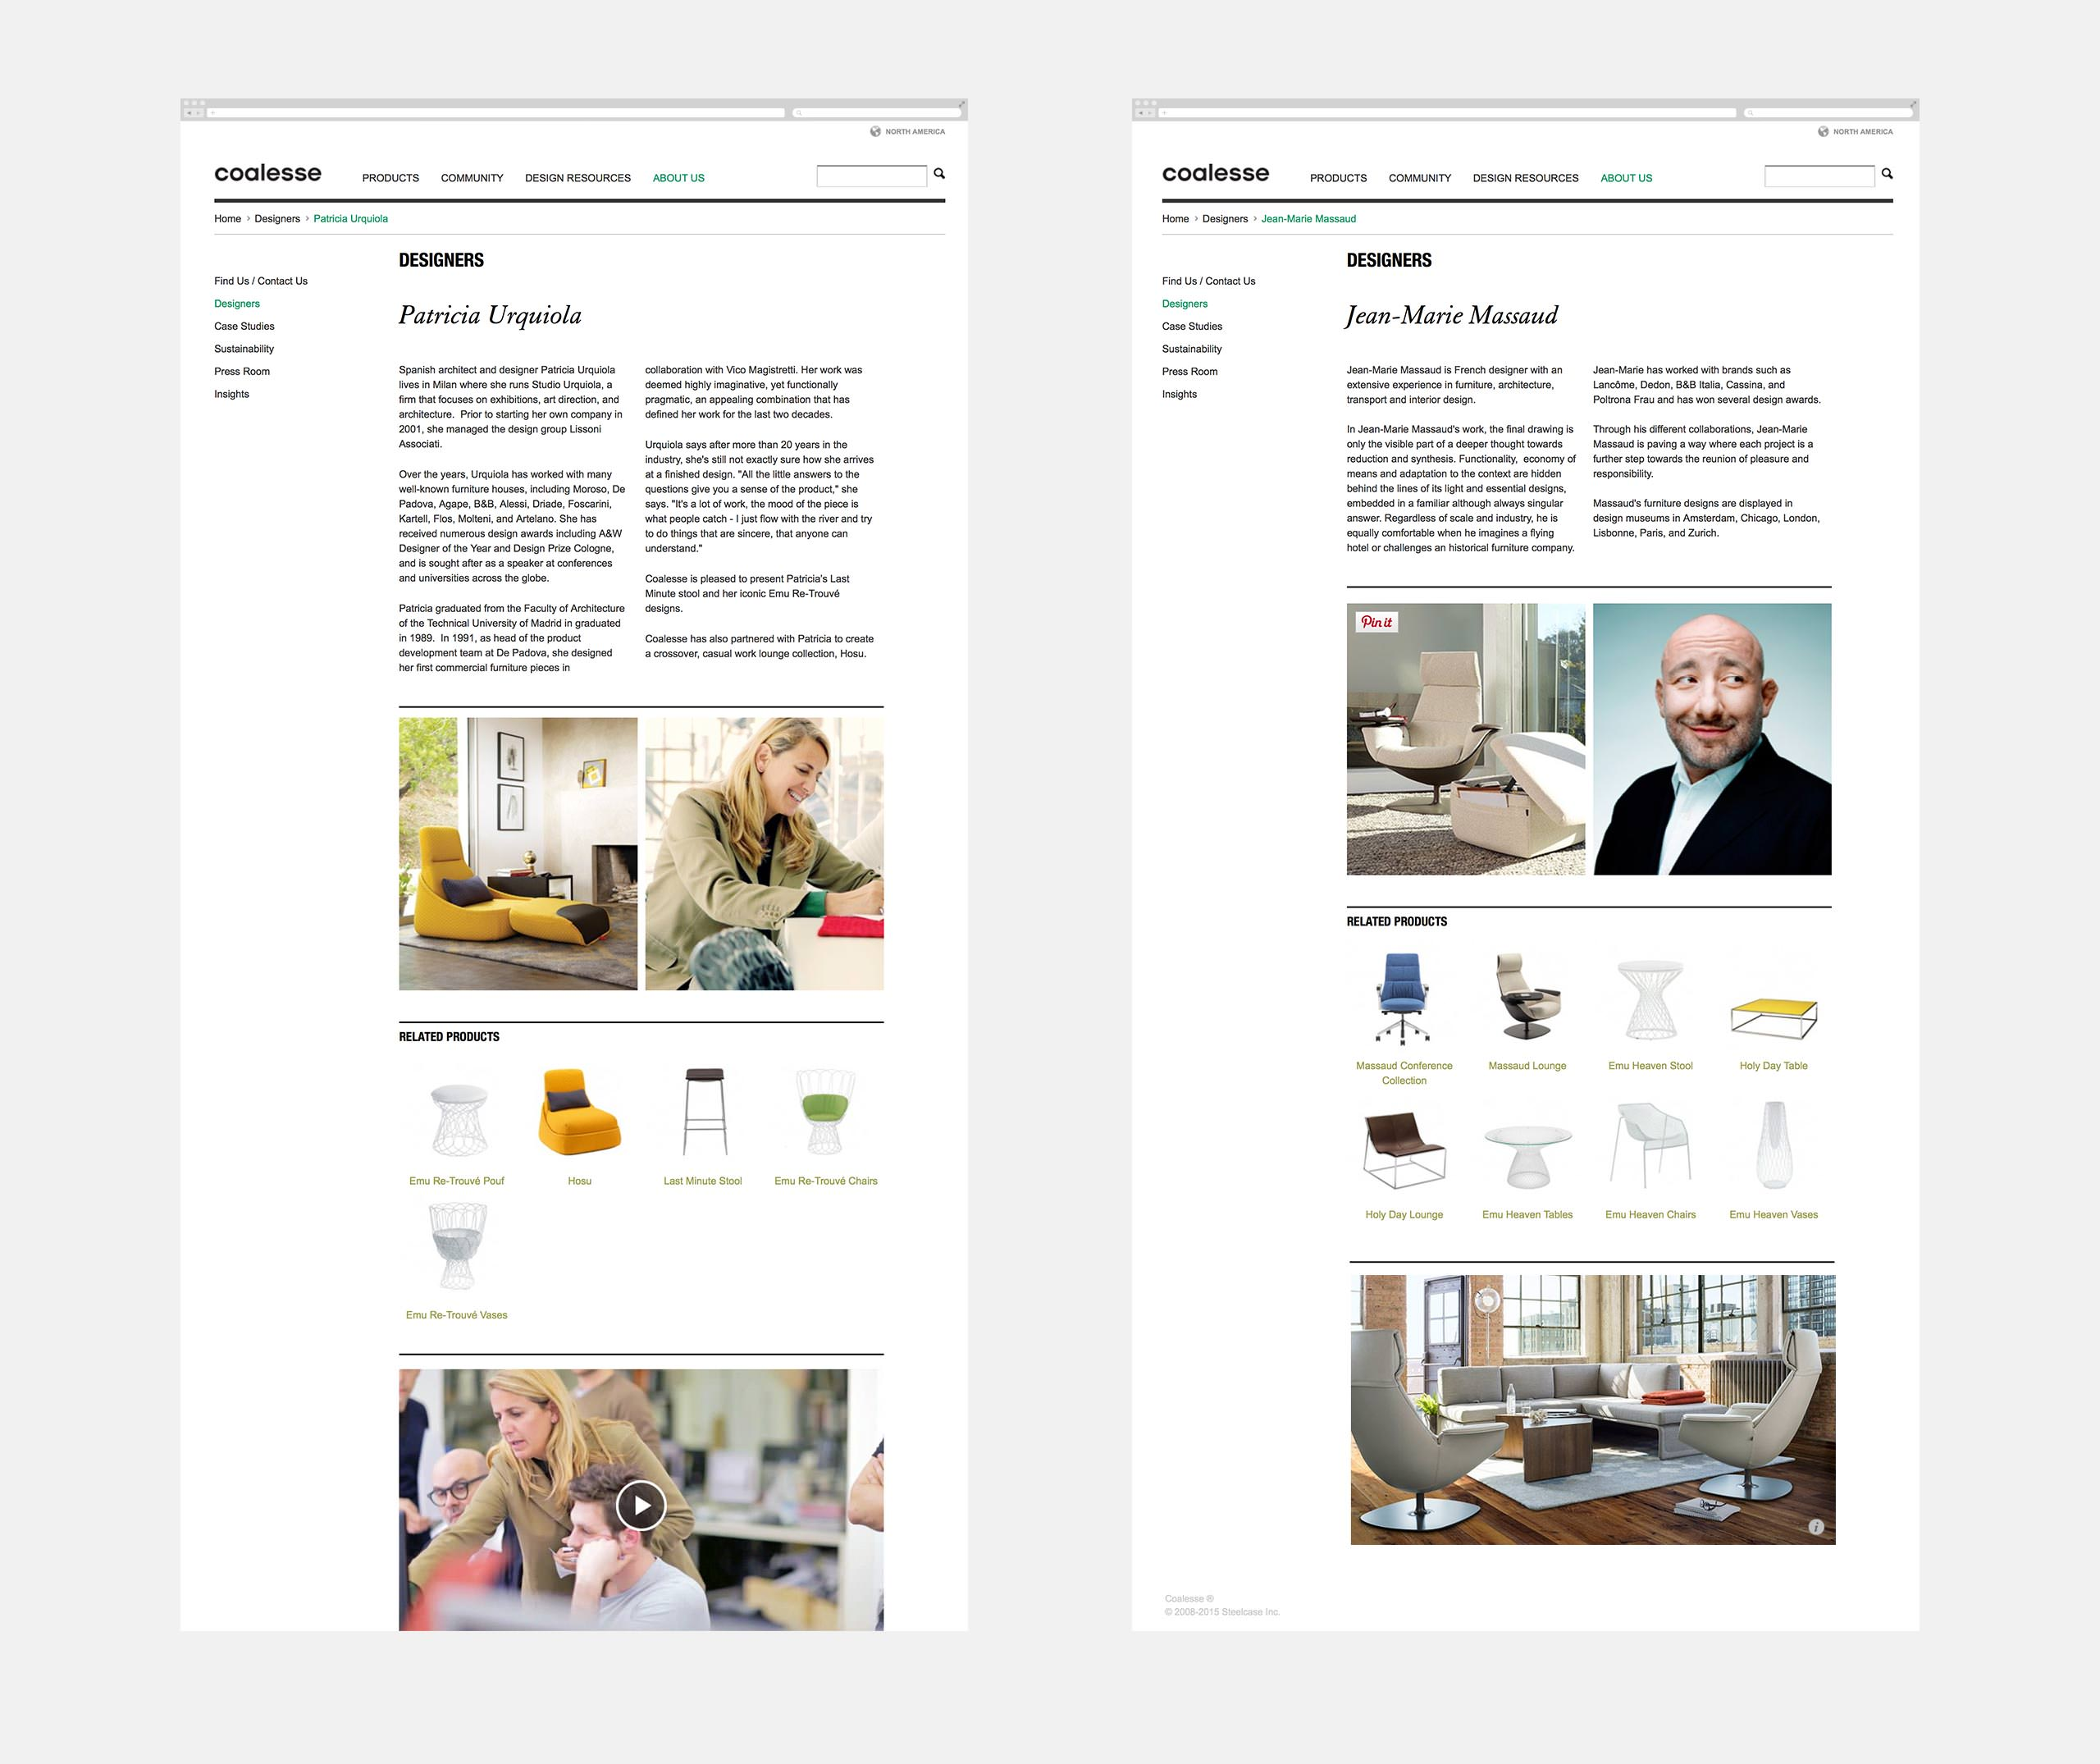 Coalesse Interactive Designers Website Page of Urquiola and Massaud